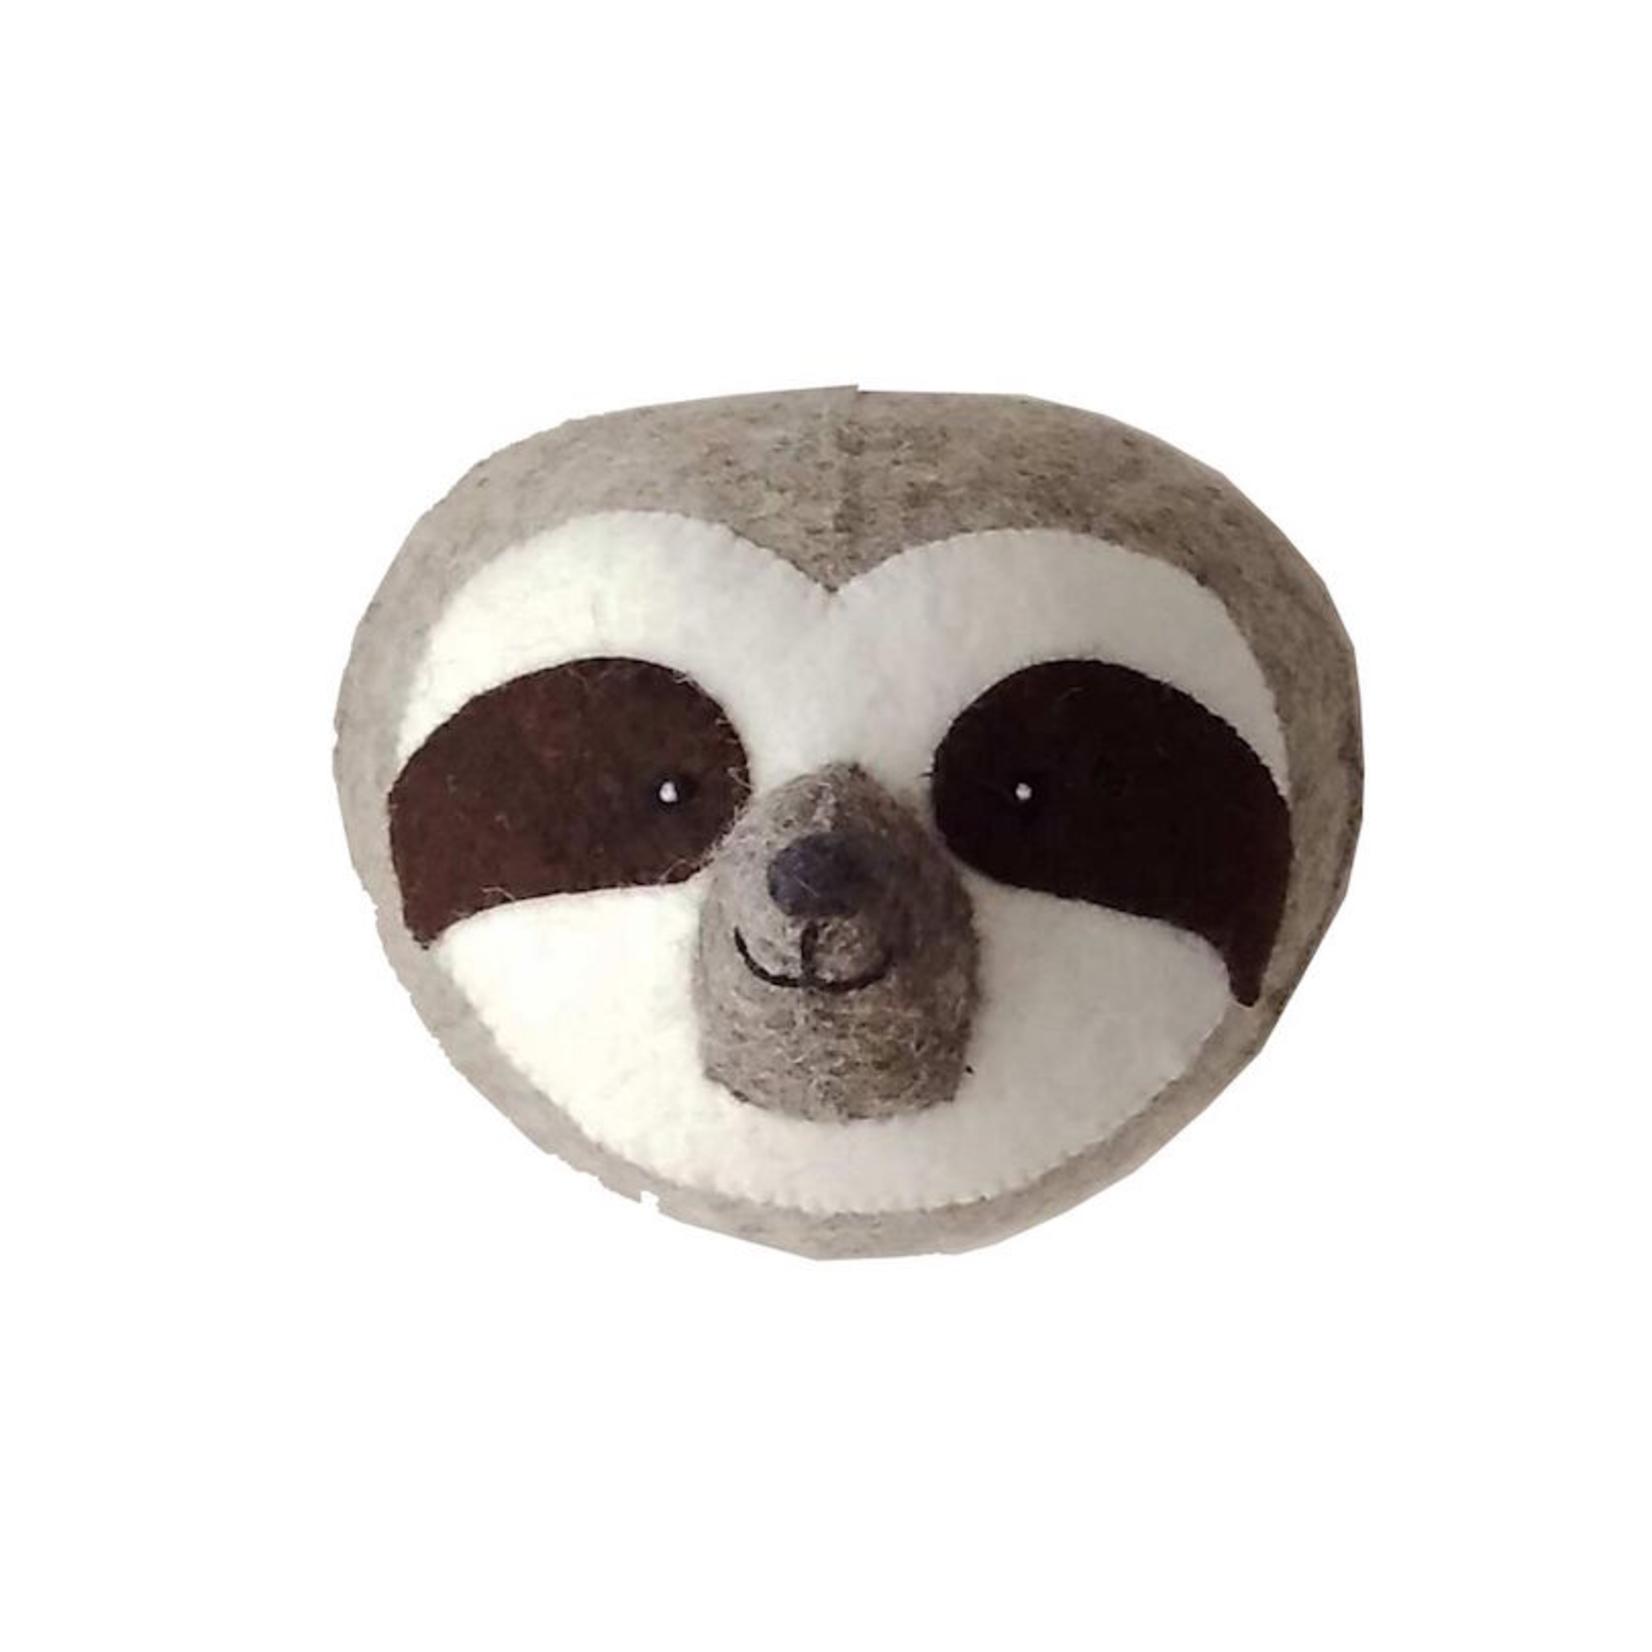 Fiona Walker Fiona Walker Mini Sloth Head